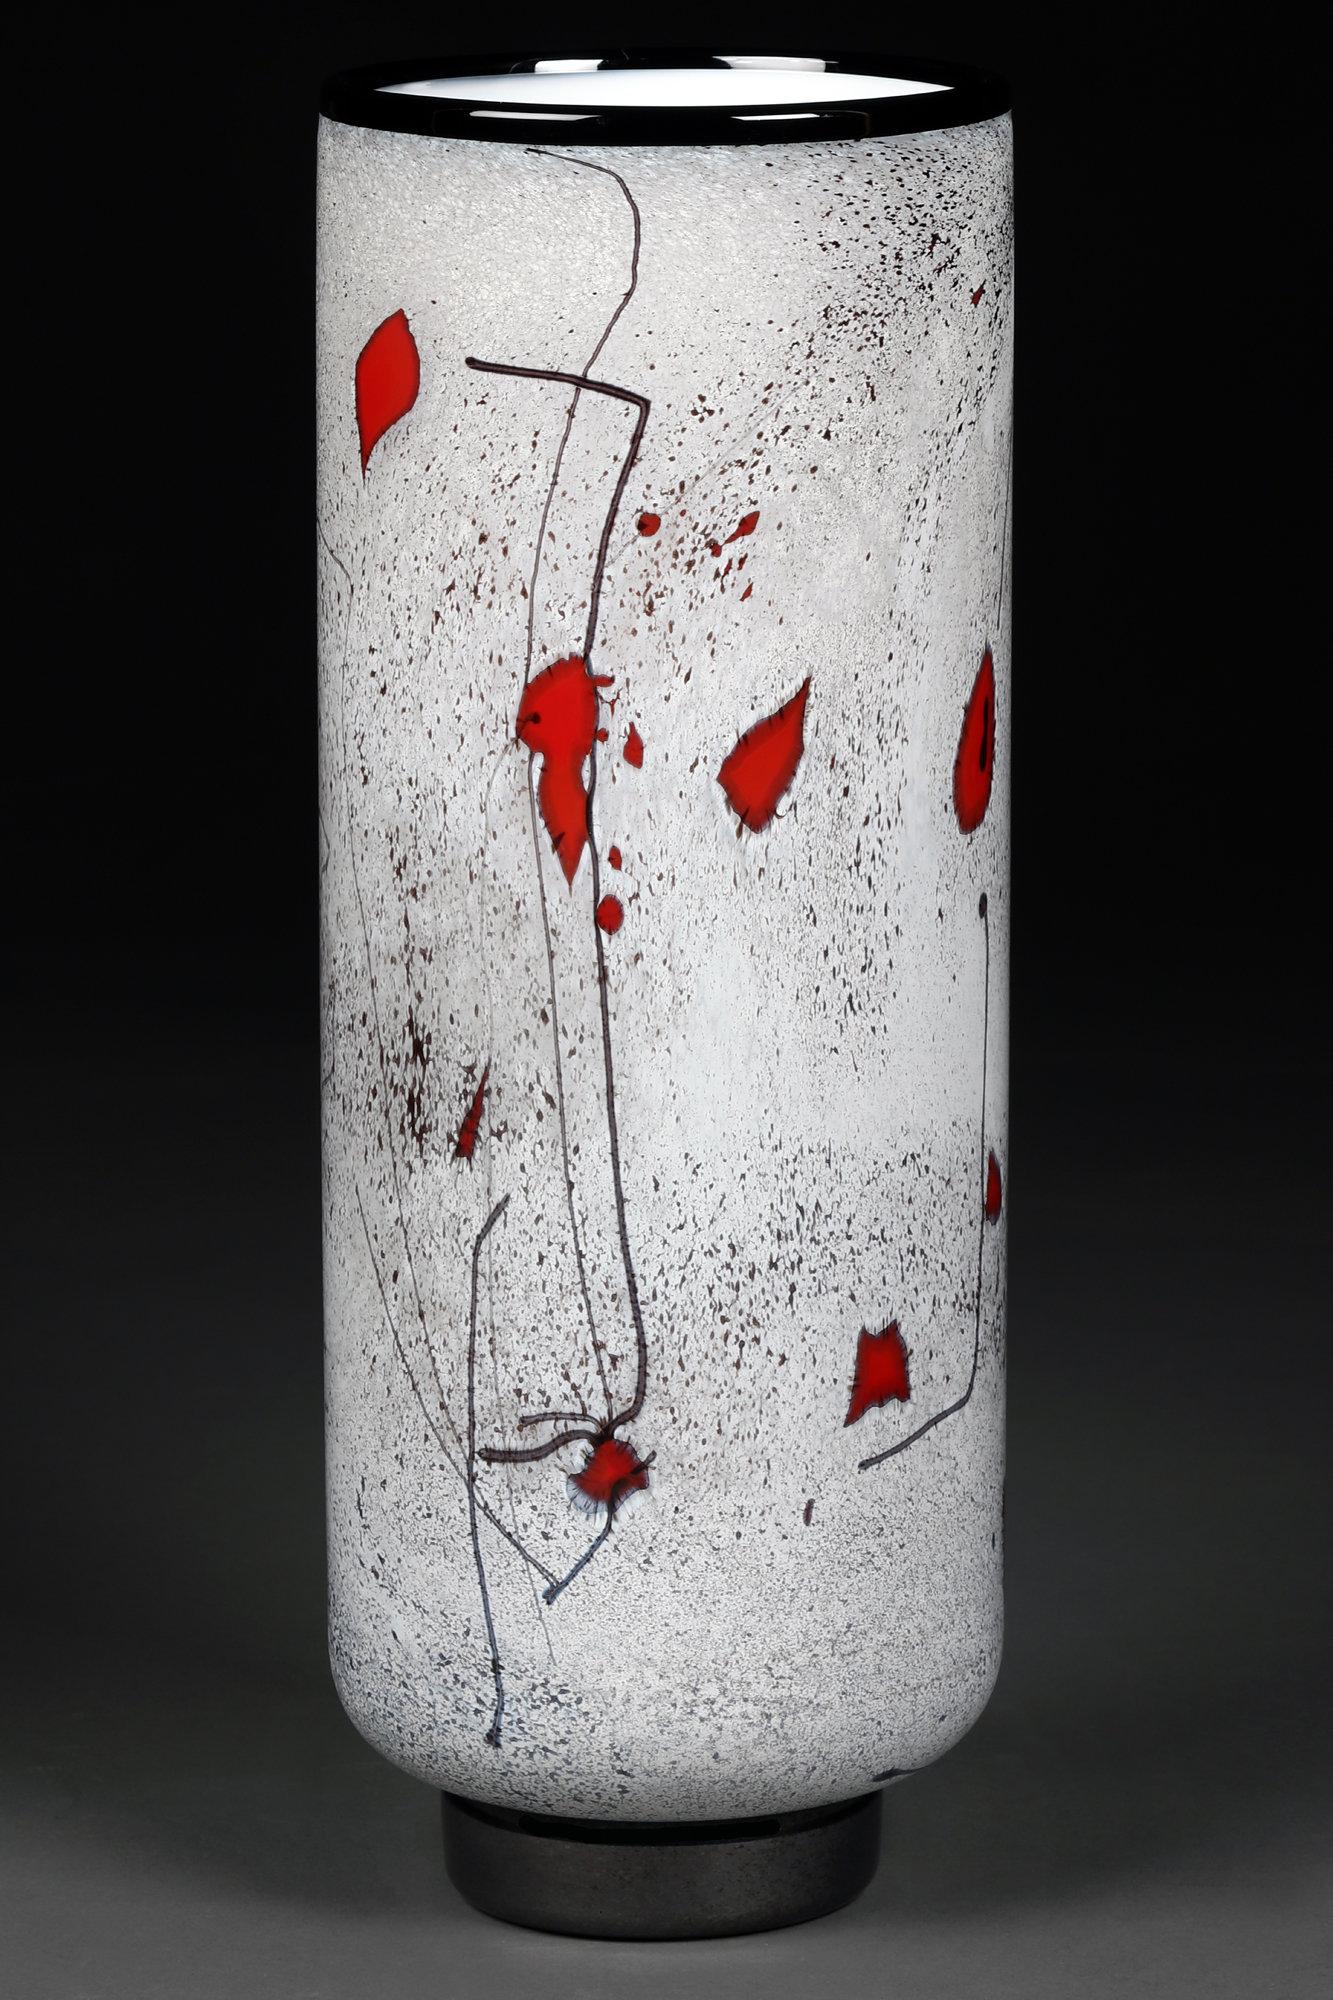 Zimska Jabluka Winter Apples Tall Vase By Eric Bladholm Art Glass Vase Artful Home